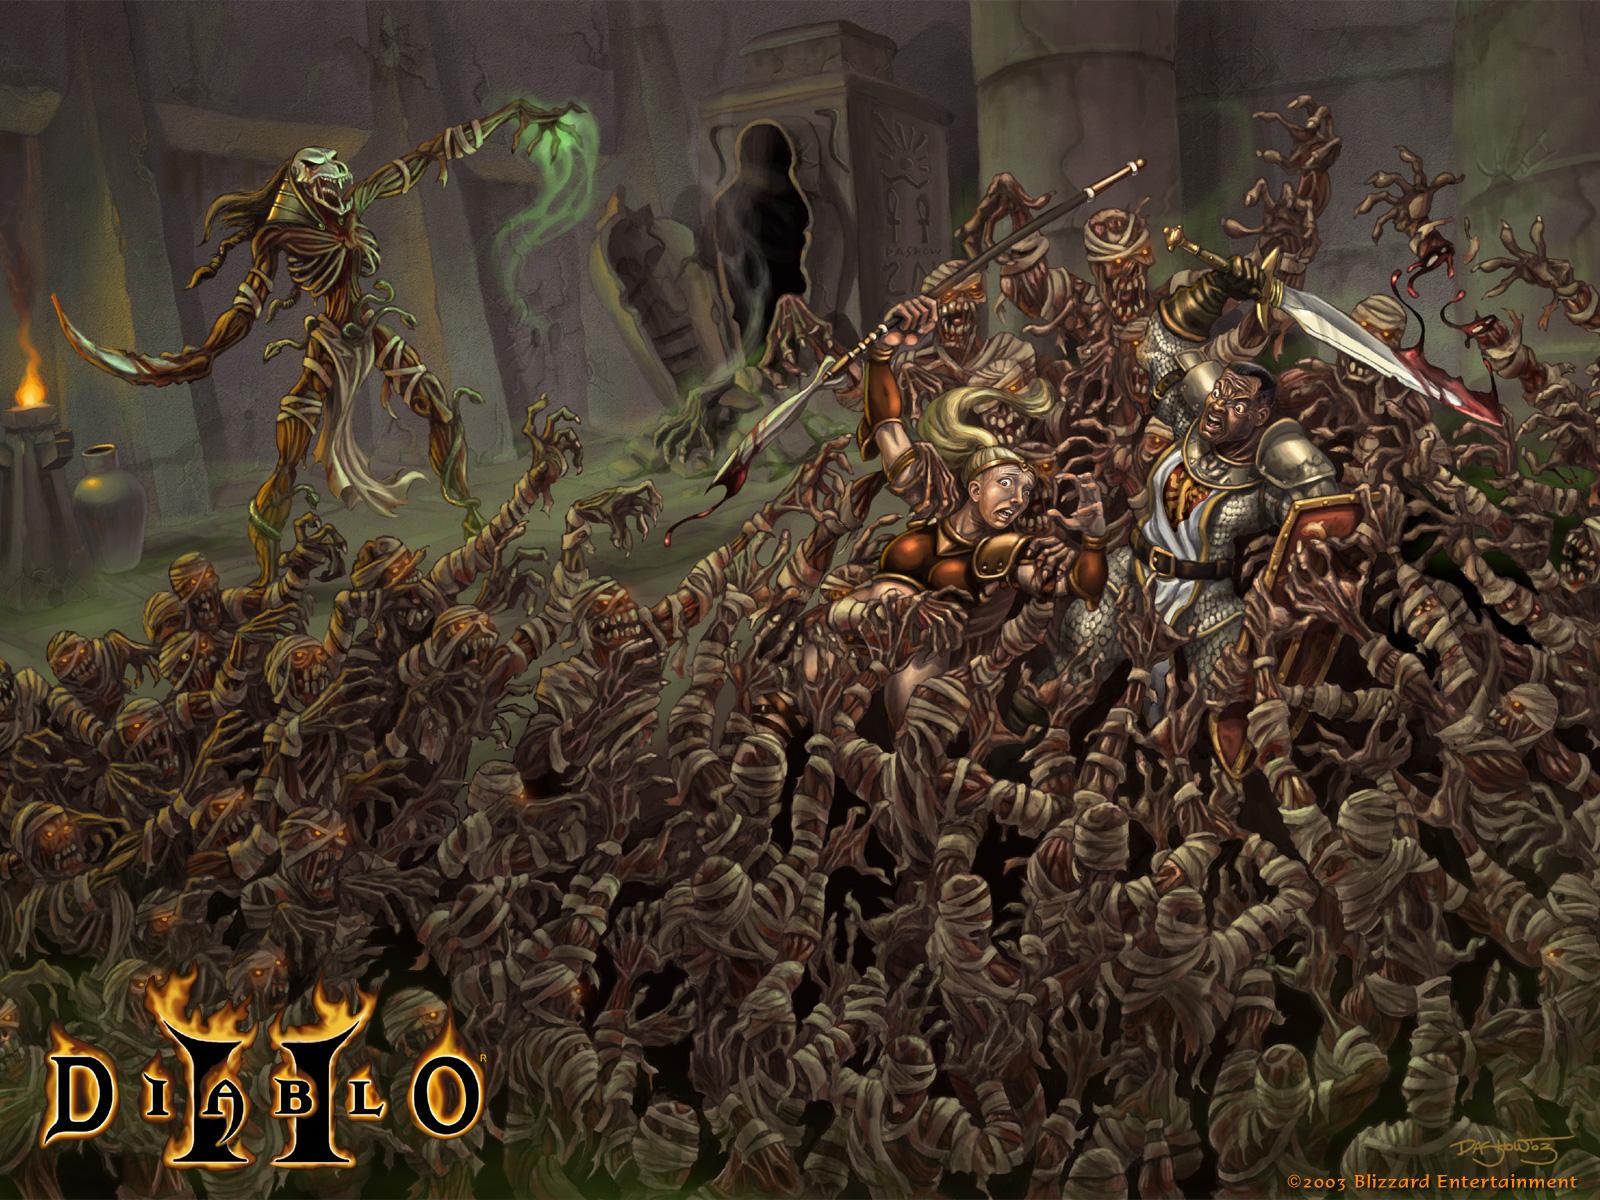 Fond d'écran Diablo 2 - 1024x768